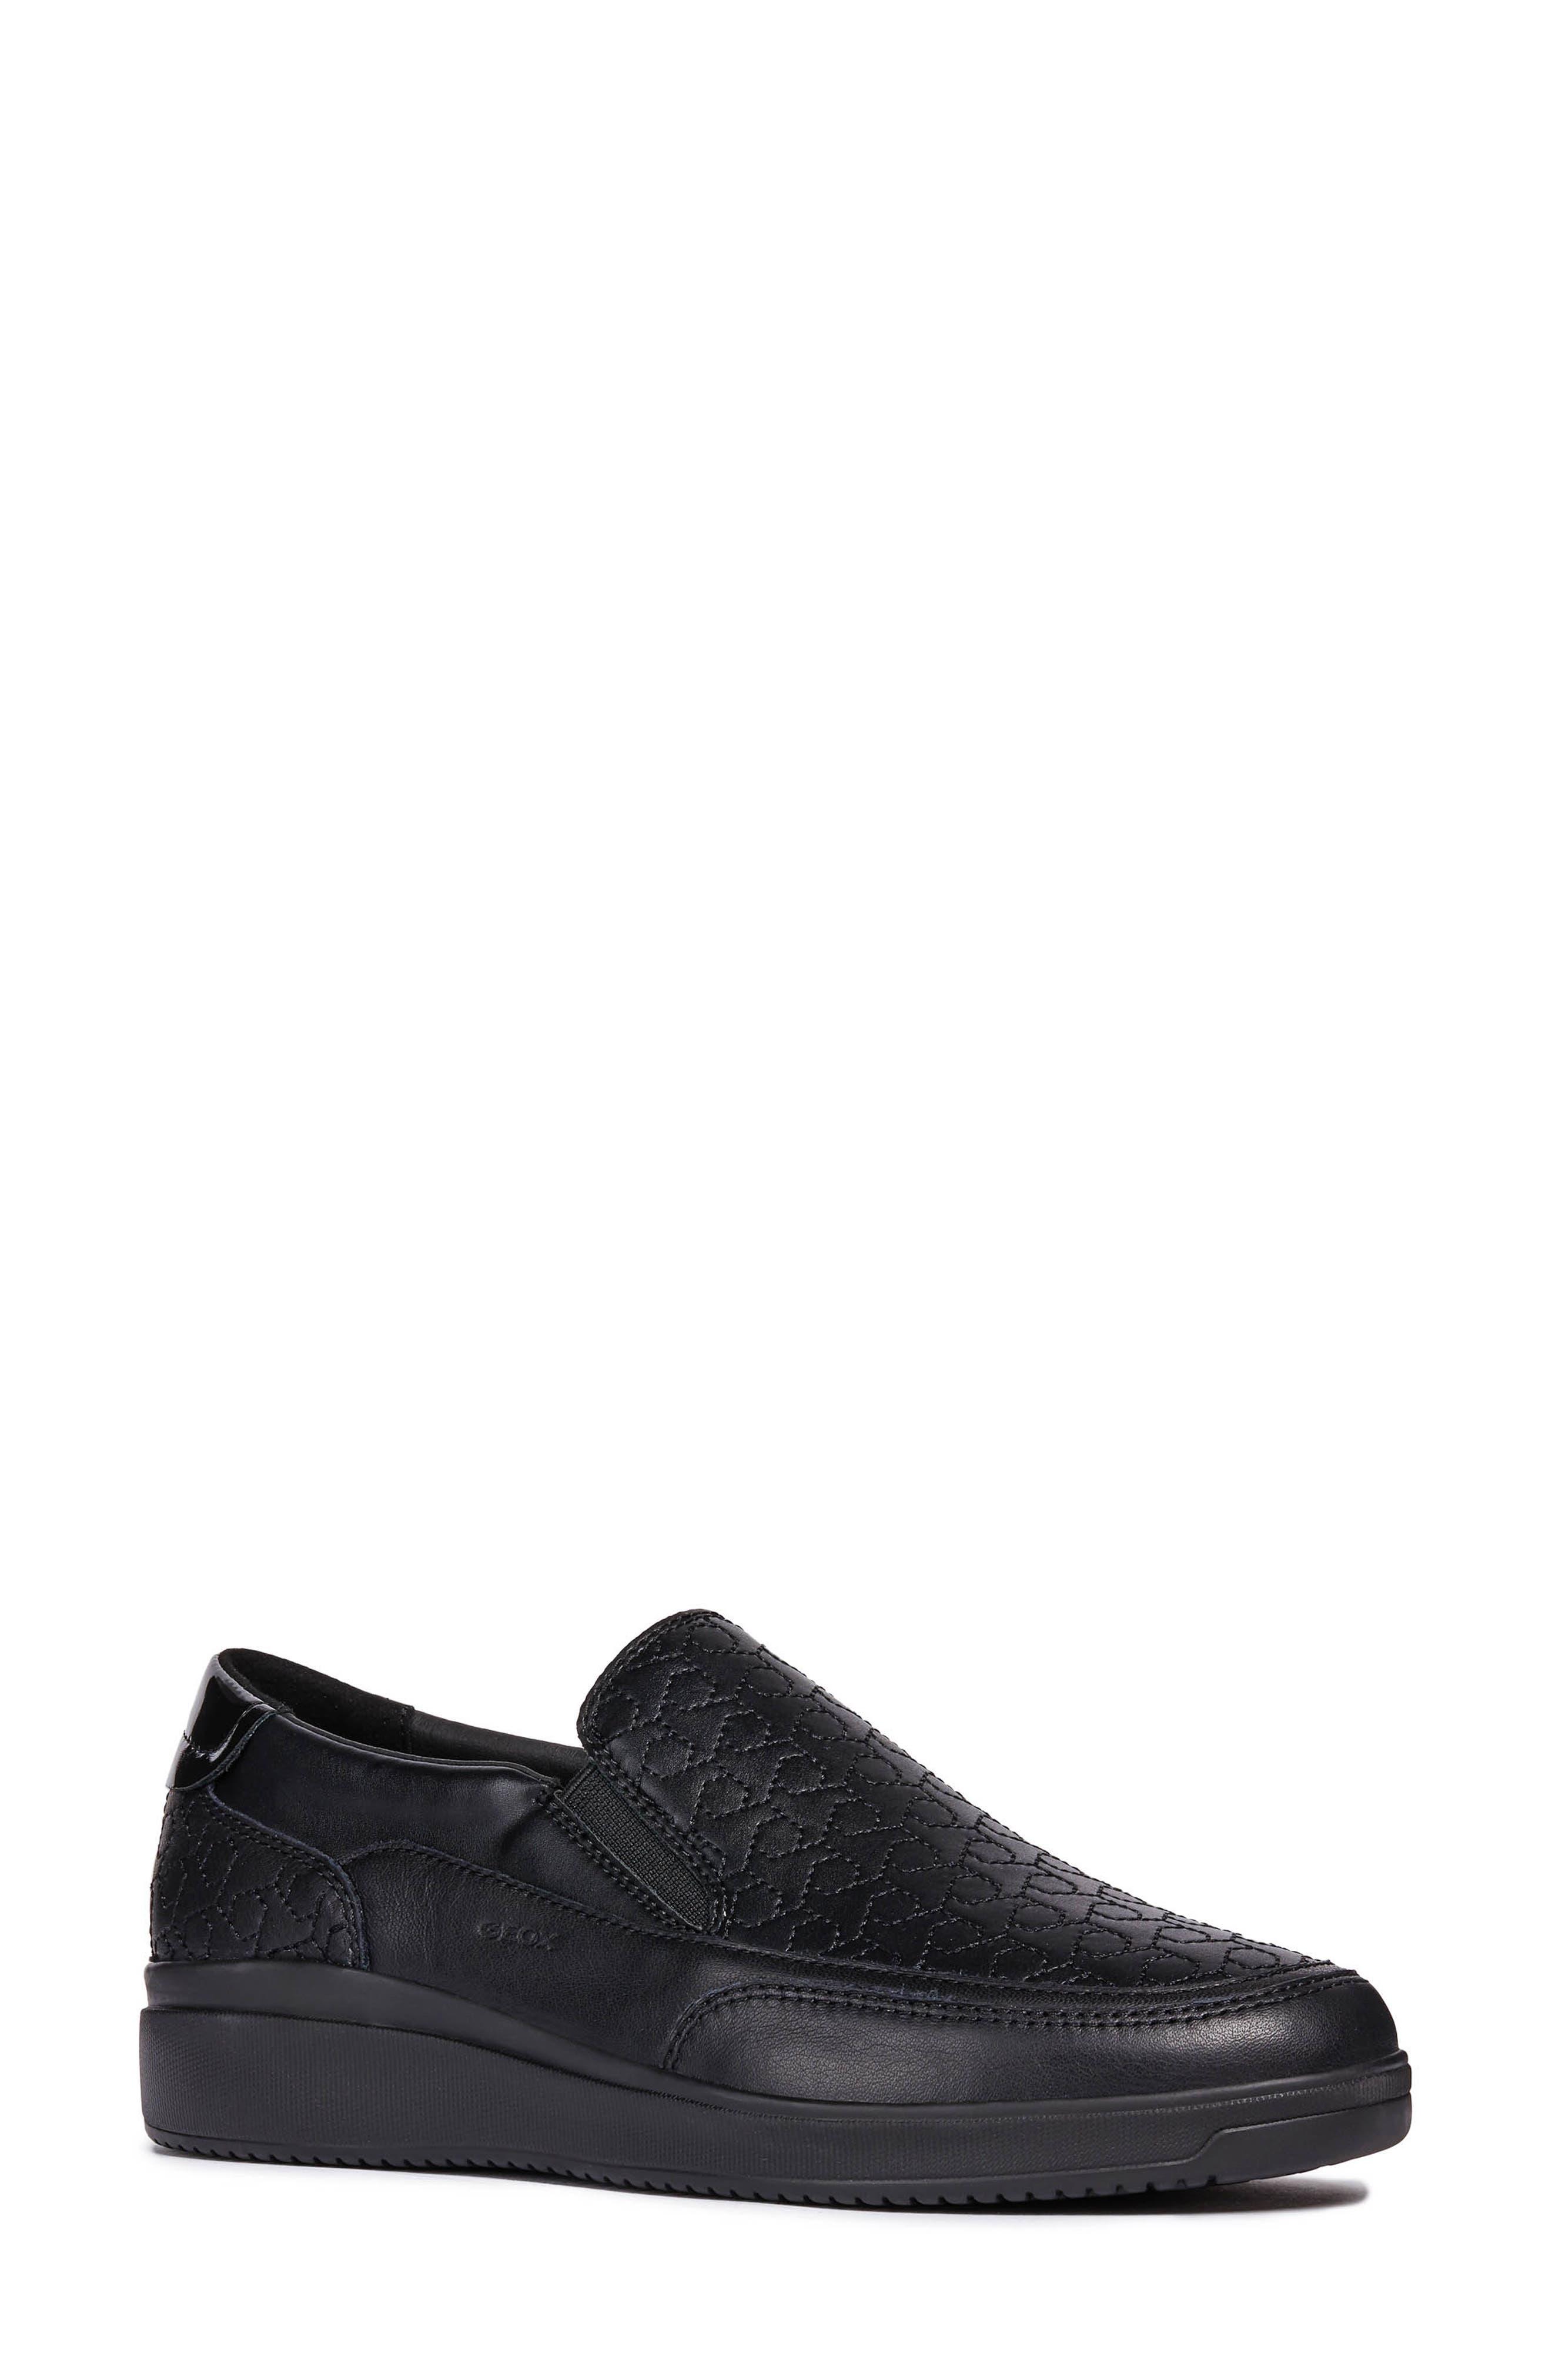 Tahina Slip-On Sneaker,                         Main,                         color, BLACK FABRIC